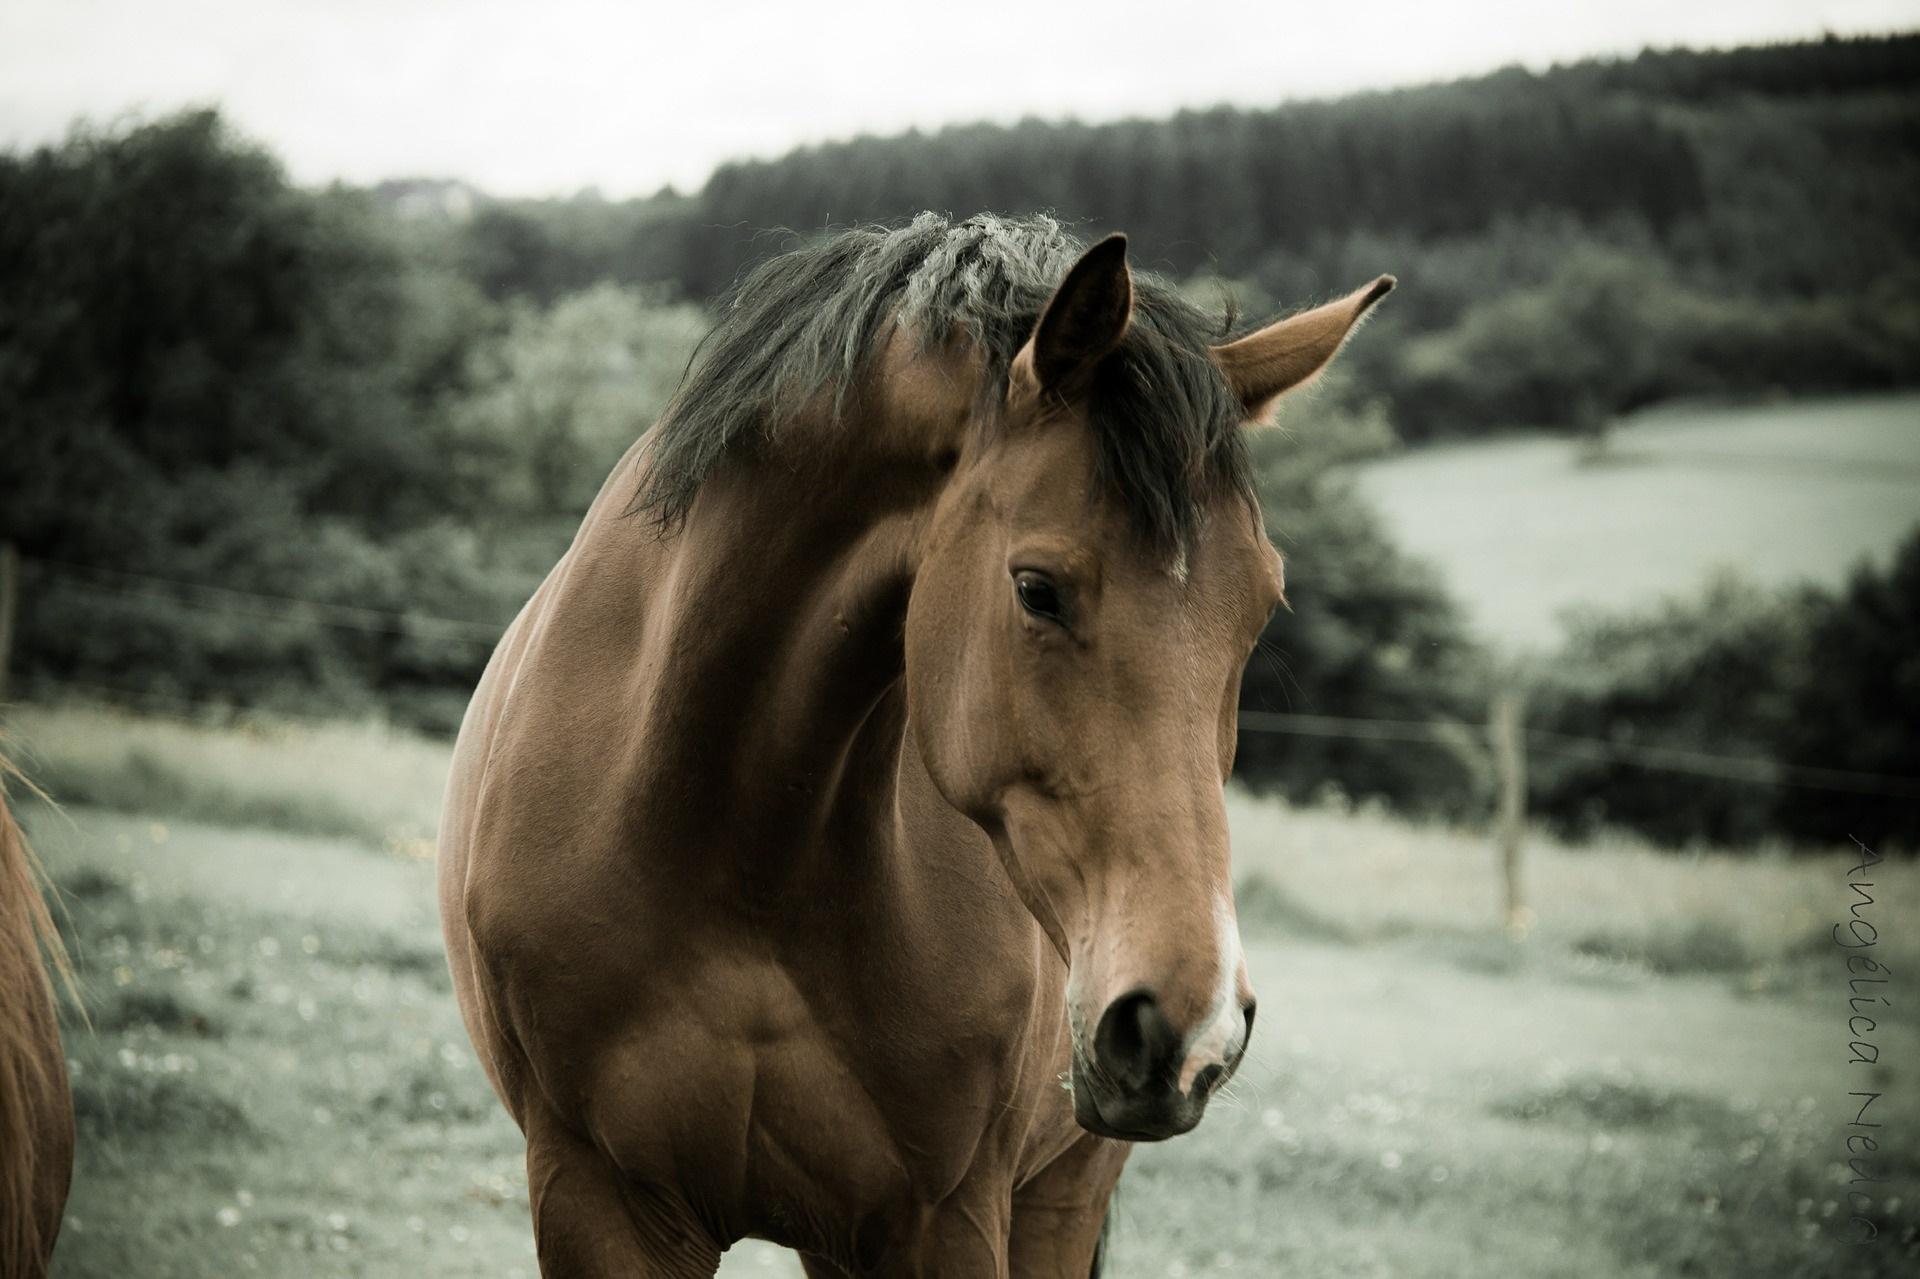 horse-458410_1920.jpg